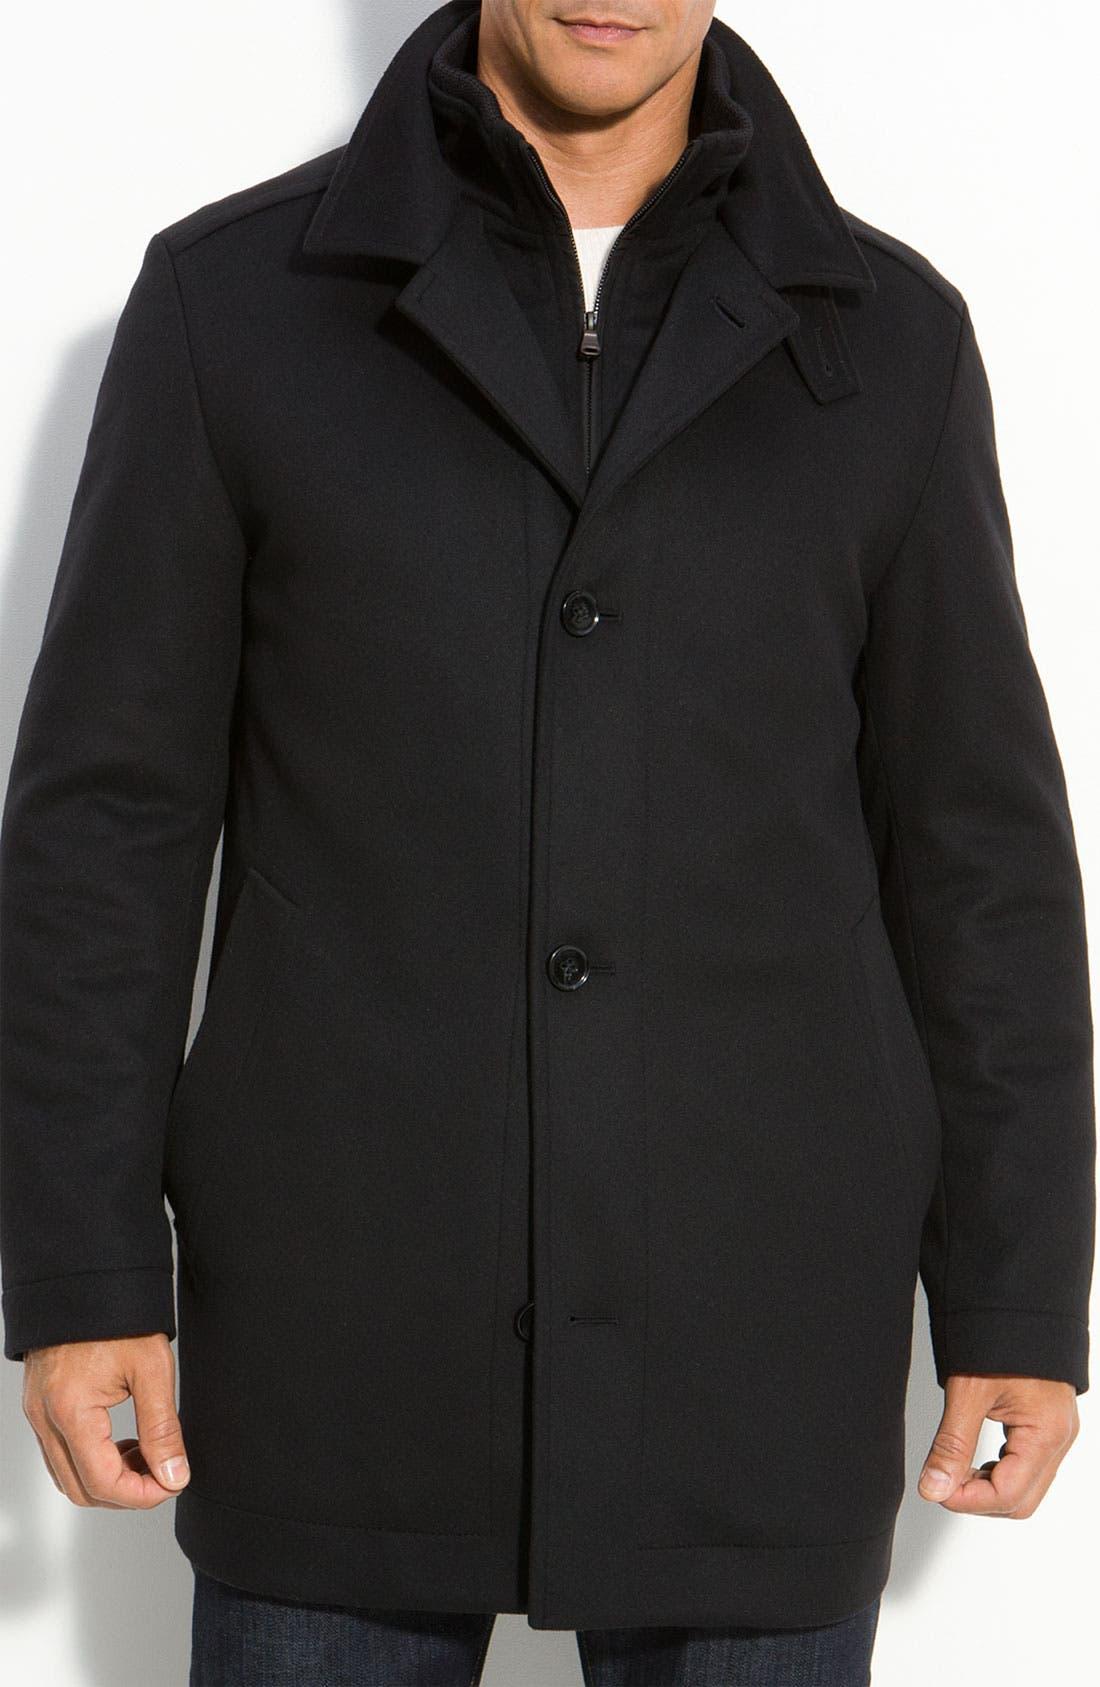 Alternate Image 1 Selected - BOSS HUGO BOSS 'Coxtan' Wool & Cashmere Coat